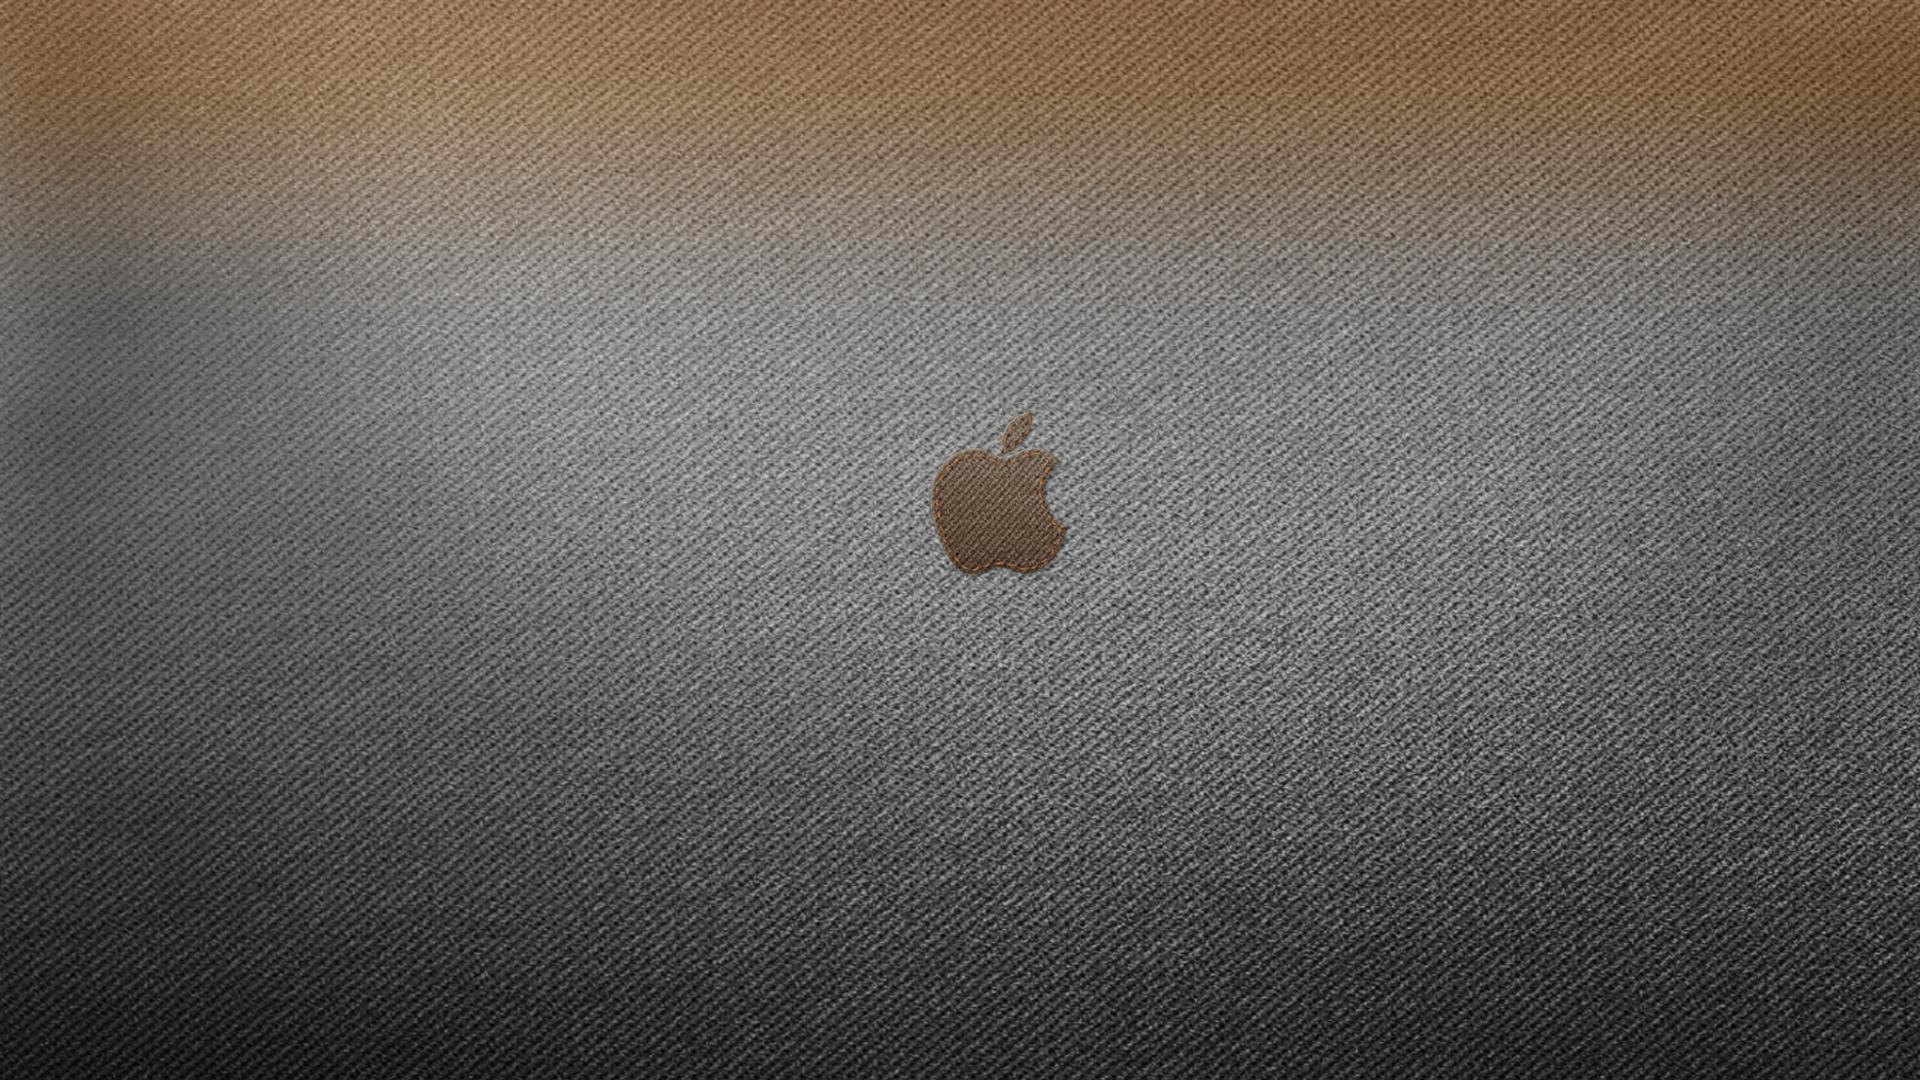 Fall Pixel Art Iphone Wallpaper Grey Backgrounds Free Download Pixelstalk Net